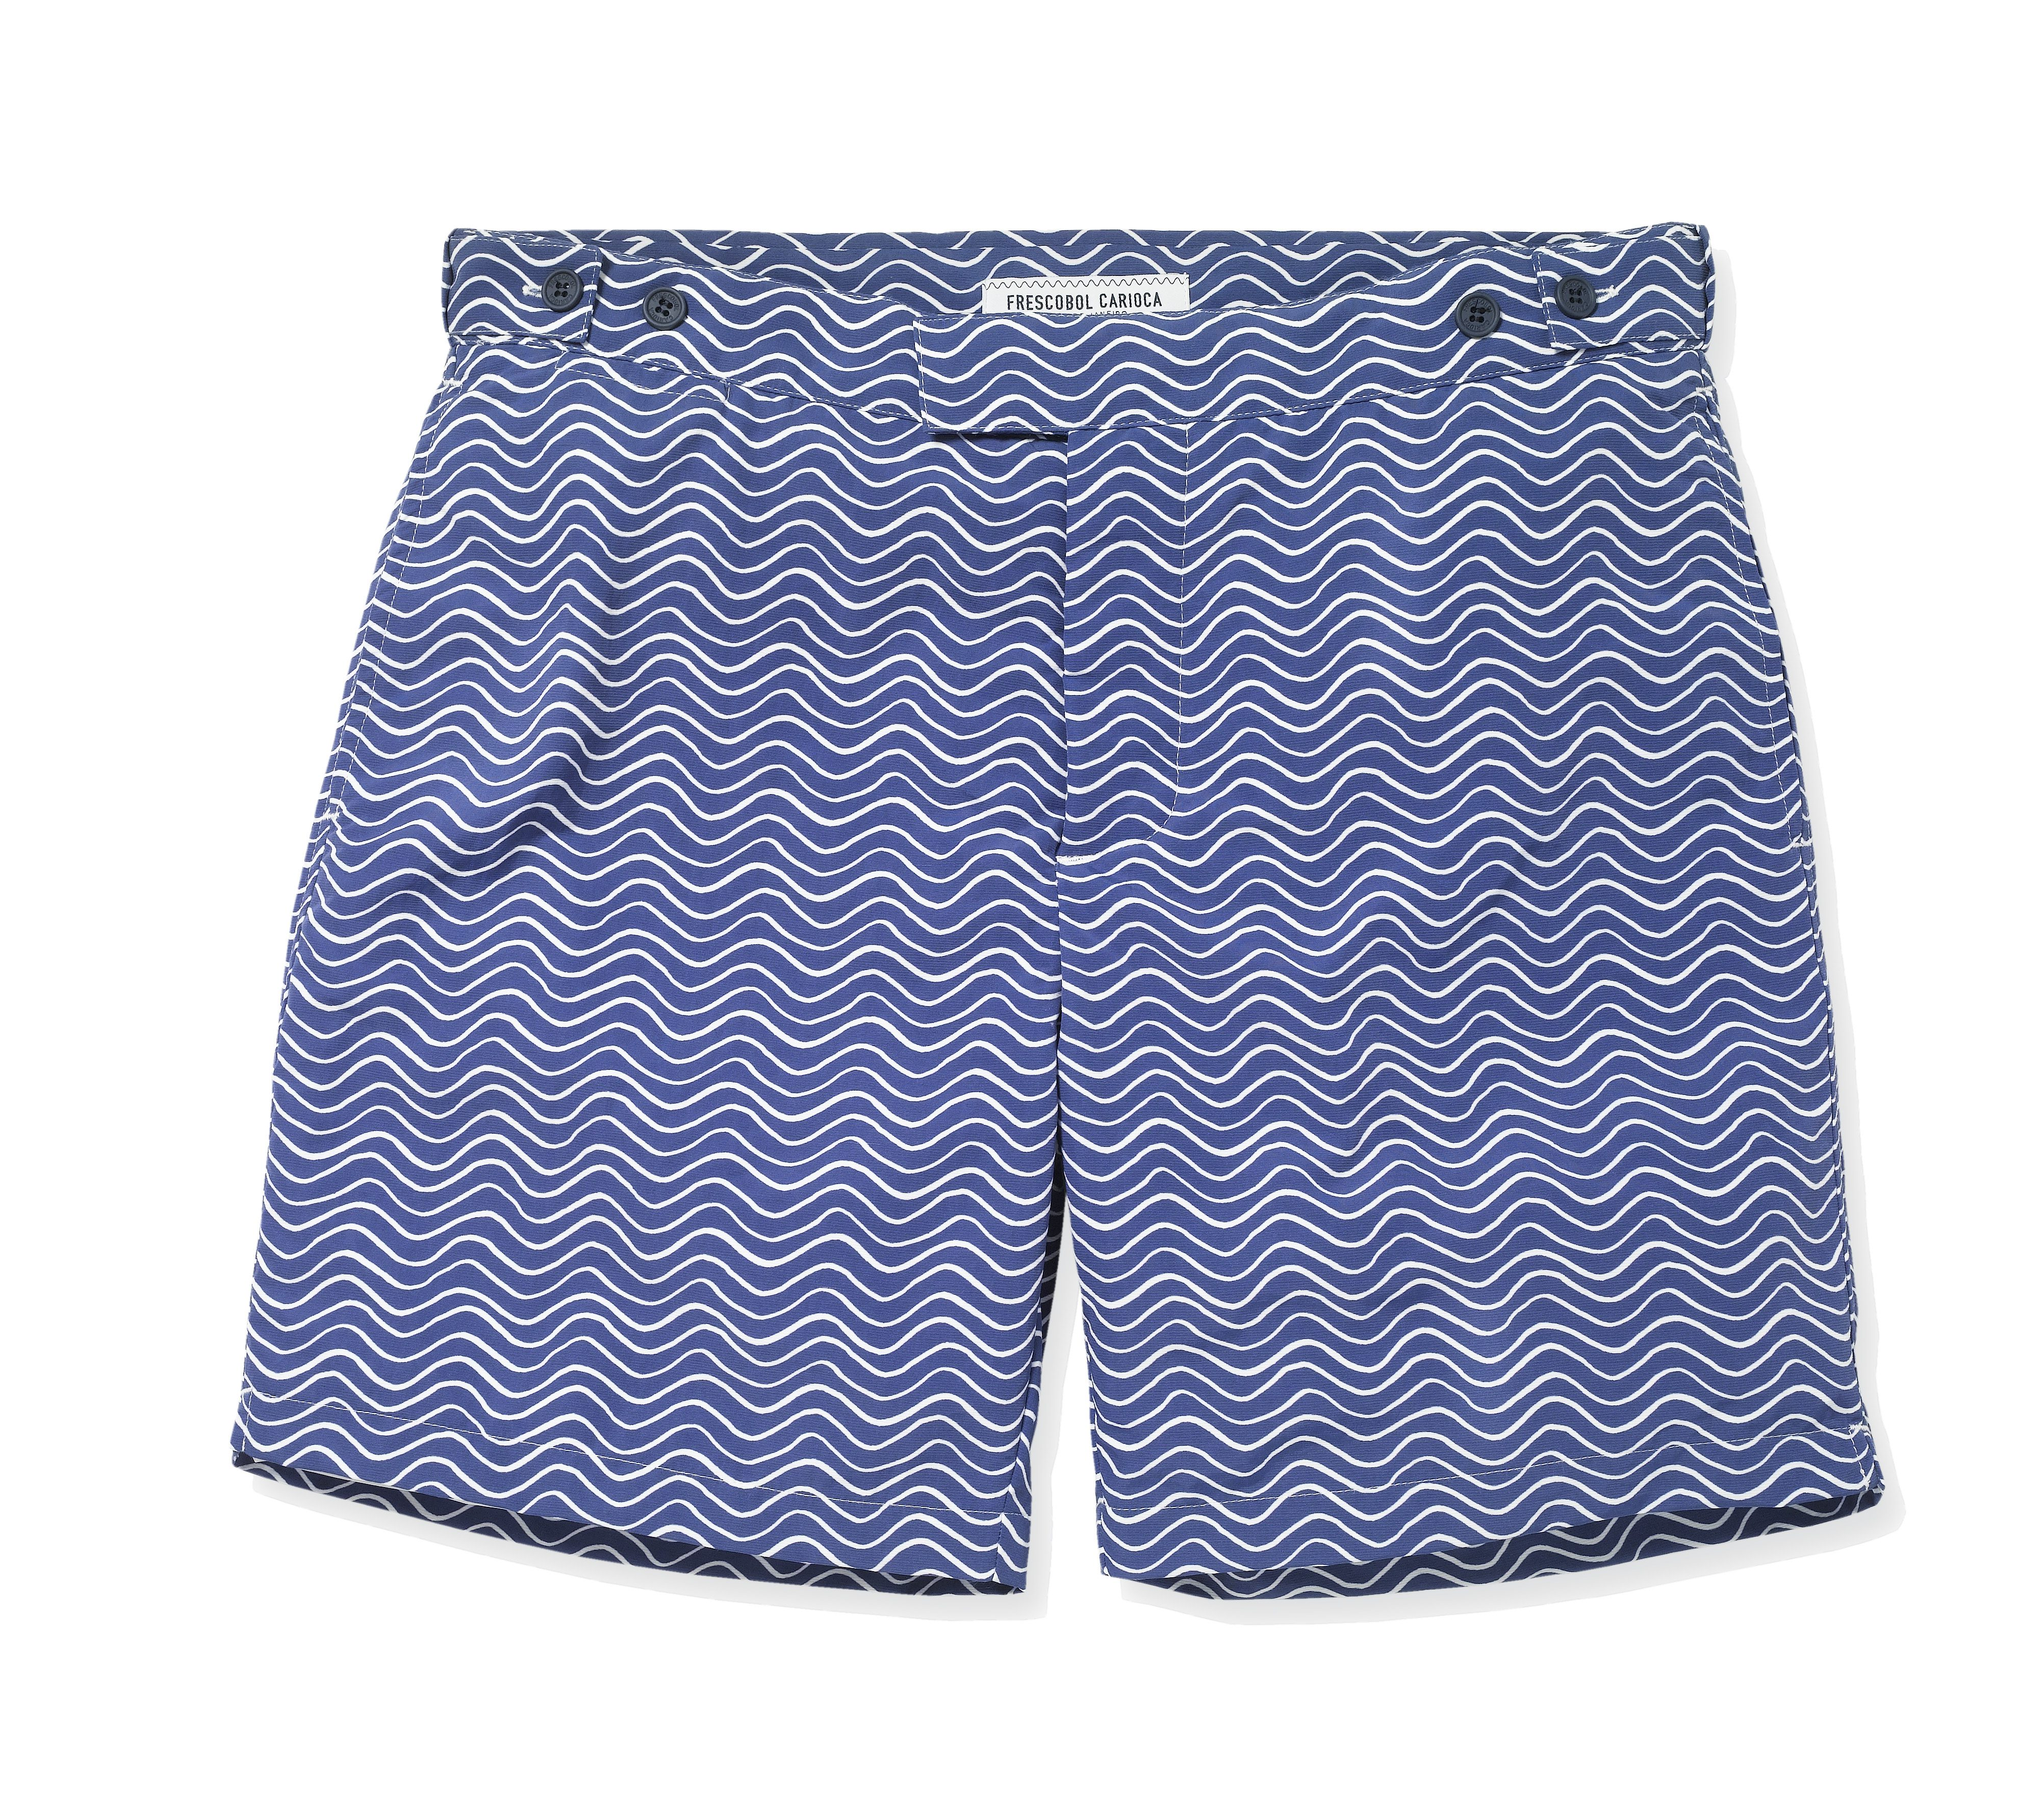 Tailored Shorts Ondas Small Navy White.jpg